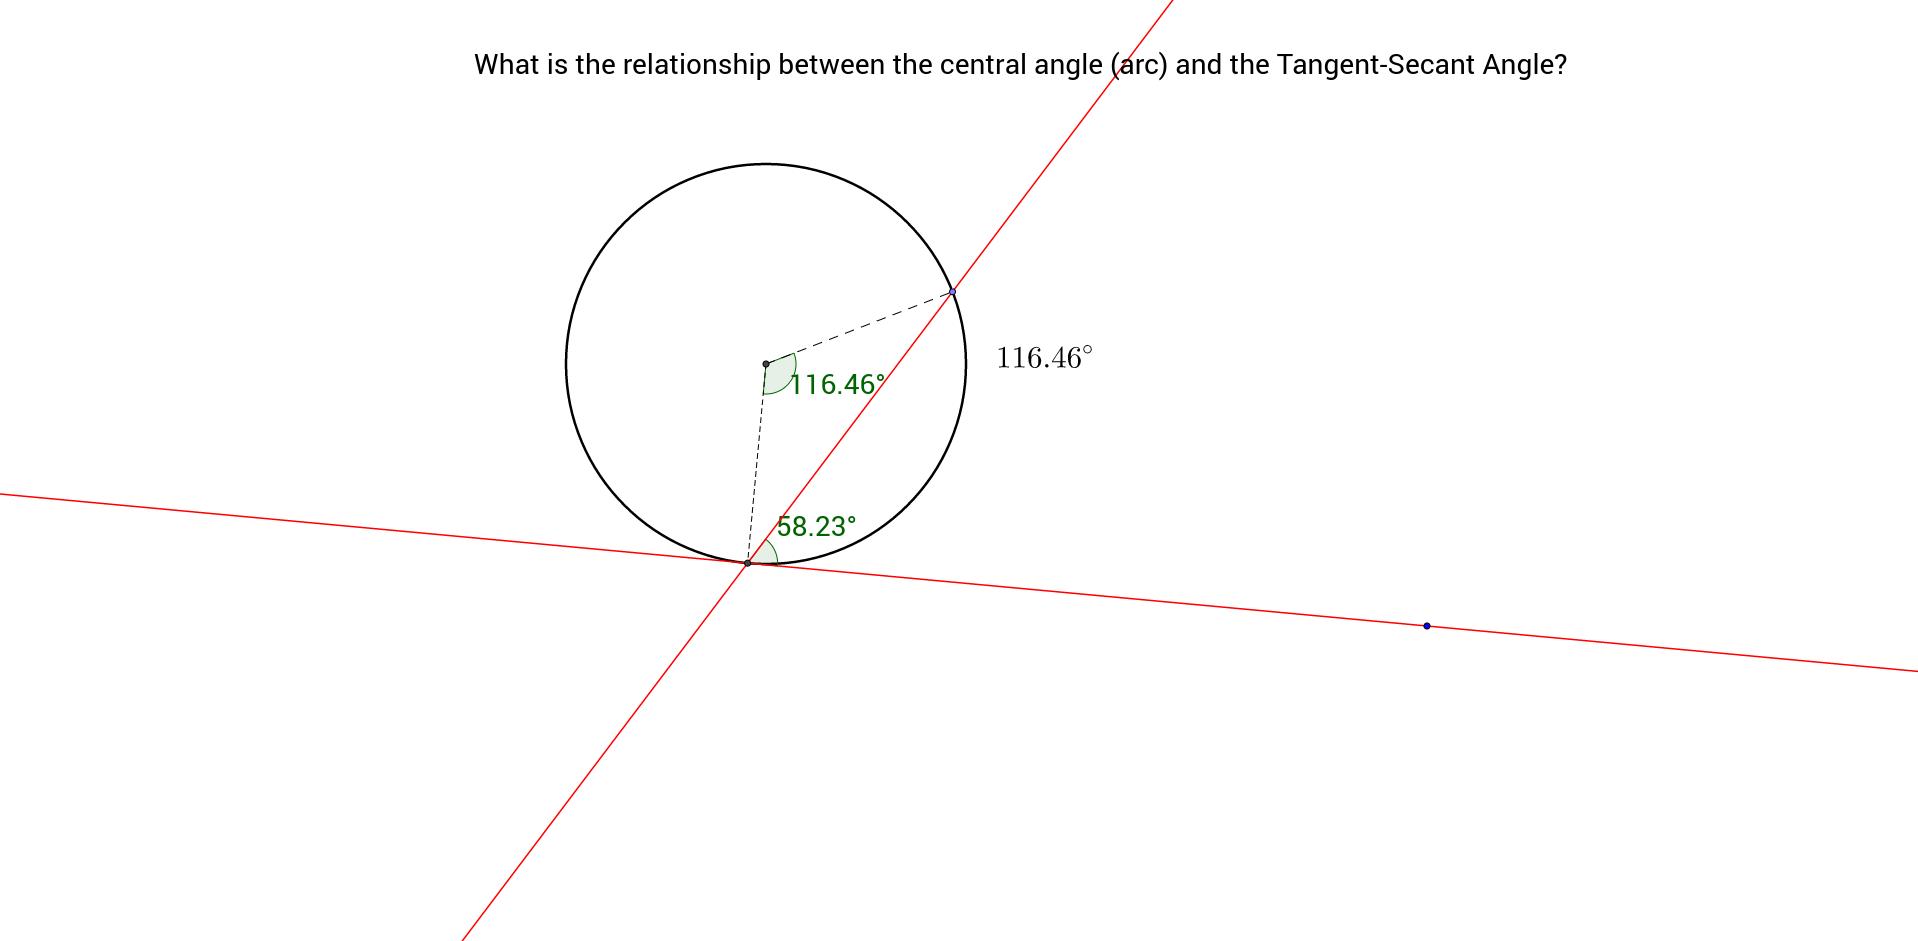 Tangent-Secant angle at Radius